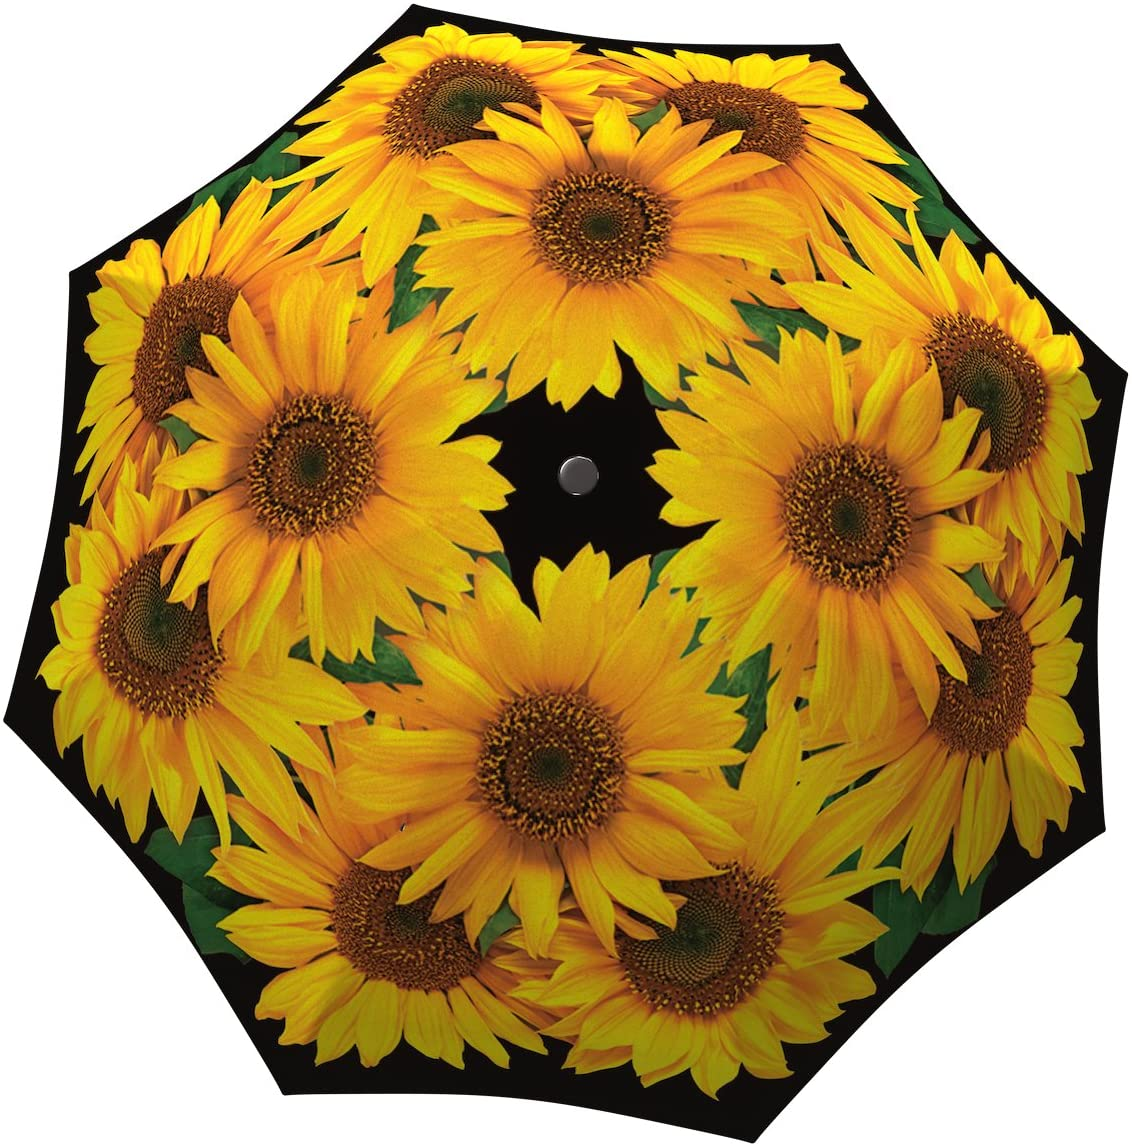 Designer Umbrella Windproof Auto Open Close - Art Umbrella for Women - Fashion Umbrella Stylish Gift - Compact Automatic Rain Umbrella Sunflowers Design - Vintage Yellow Flowers Umbrella Travel by LB